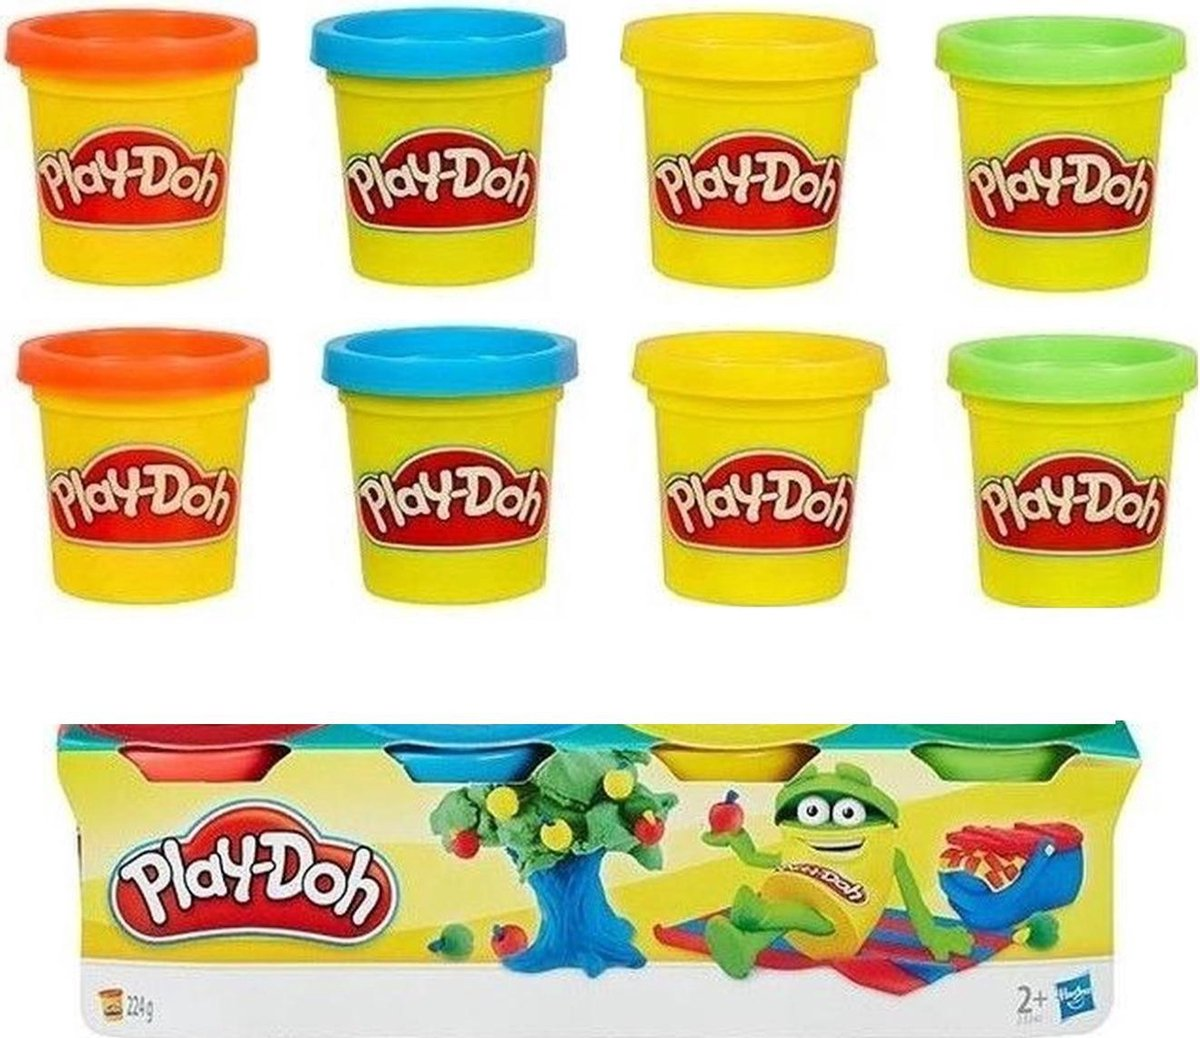 Hasbro - Play-Doh Klei Mini 8-pack - Set van 2 stuks - 4 kleuren